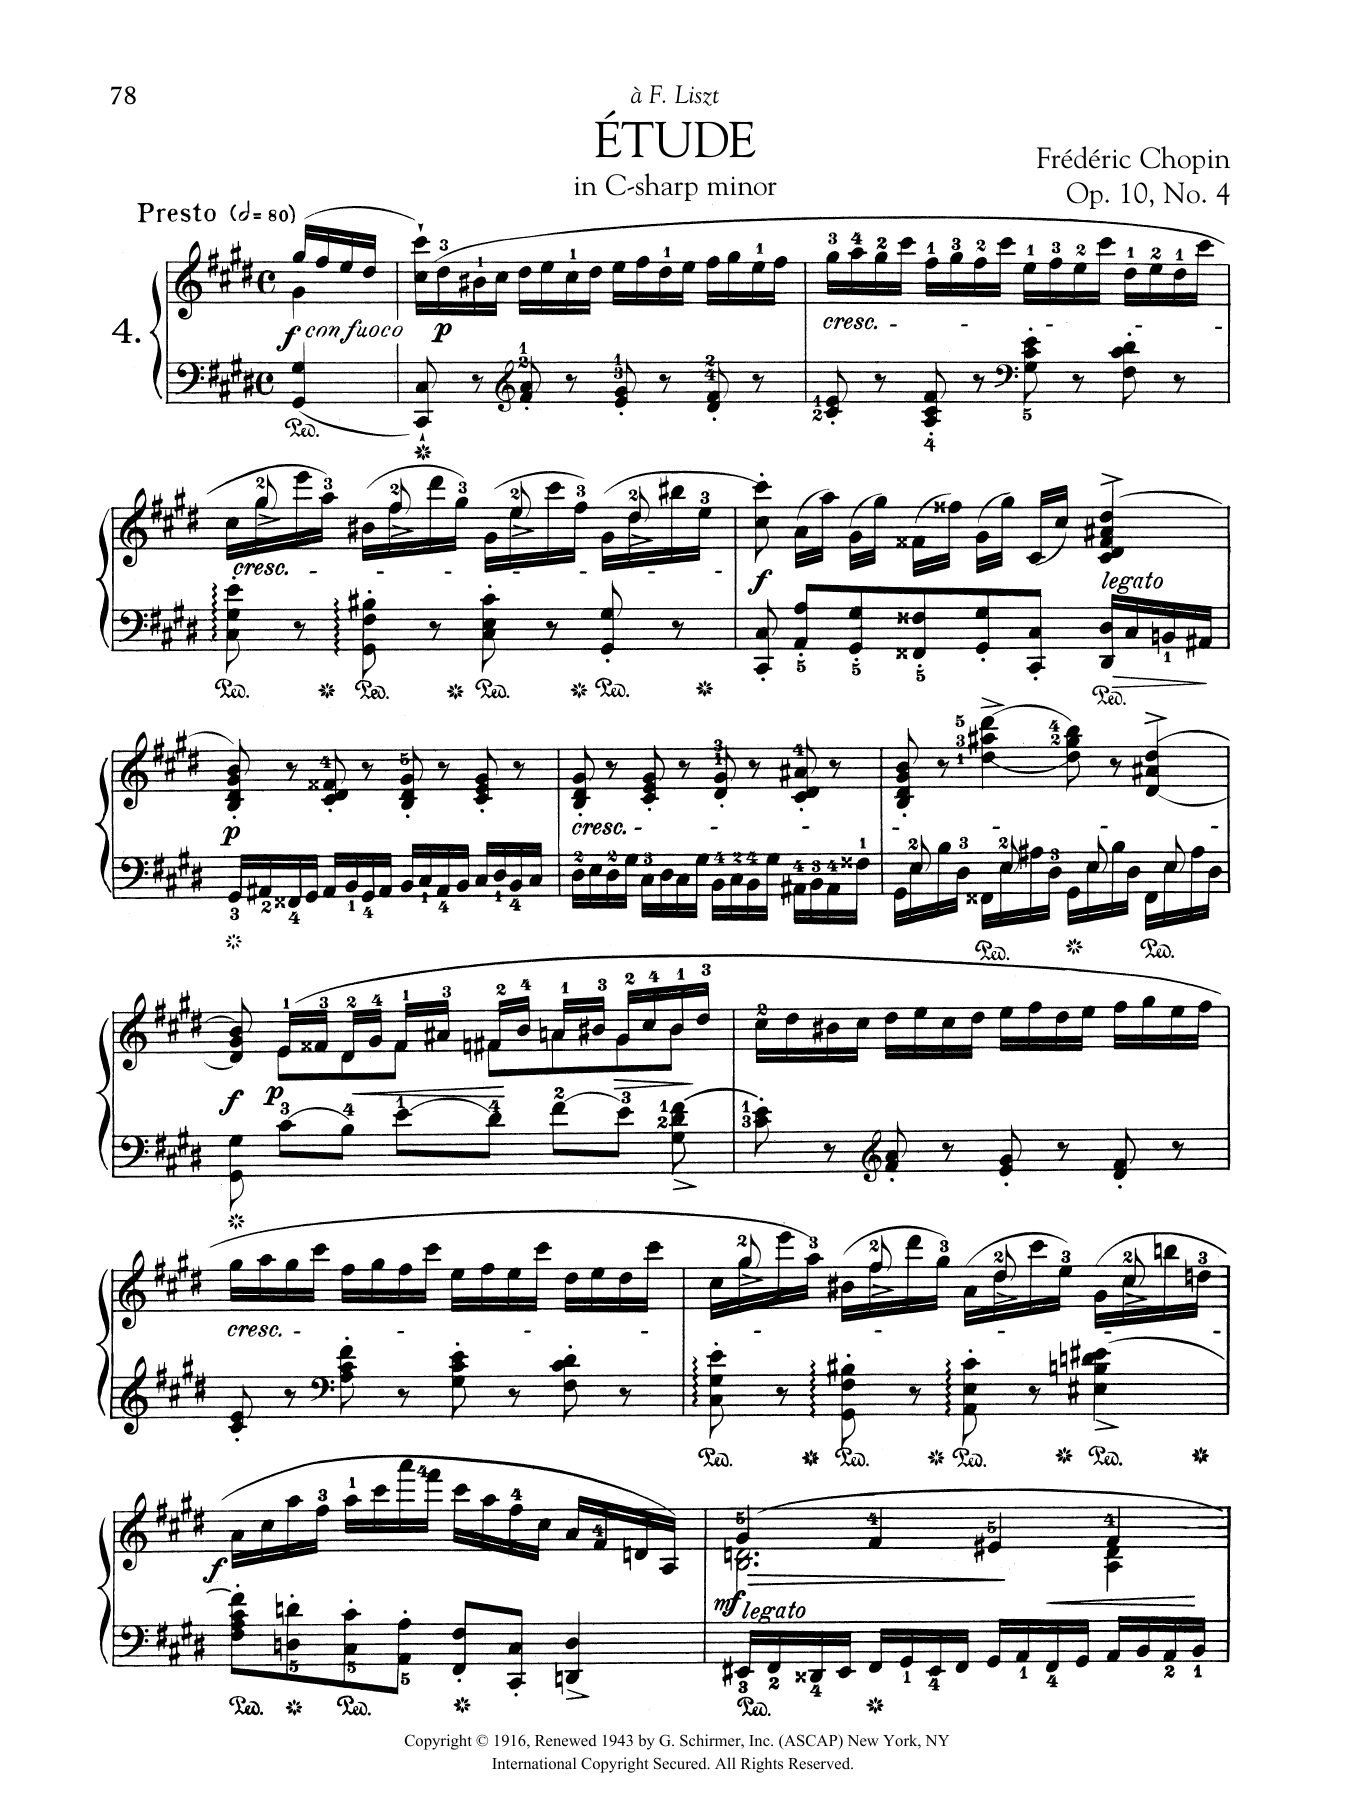 Etude in C-sharp minor, Op. 10, No. 4 Sheet Music